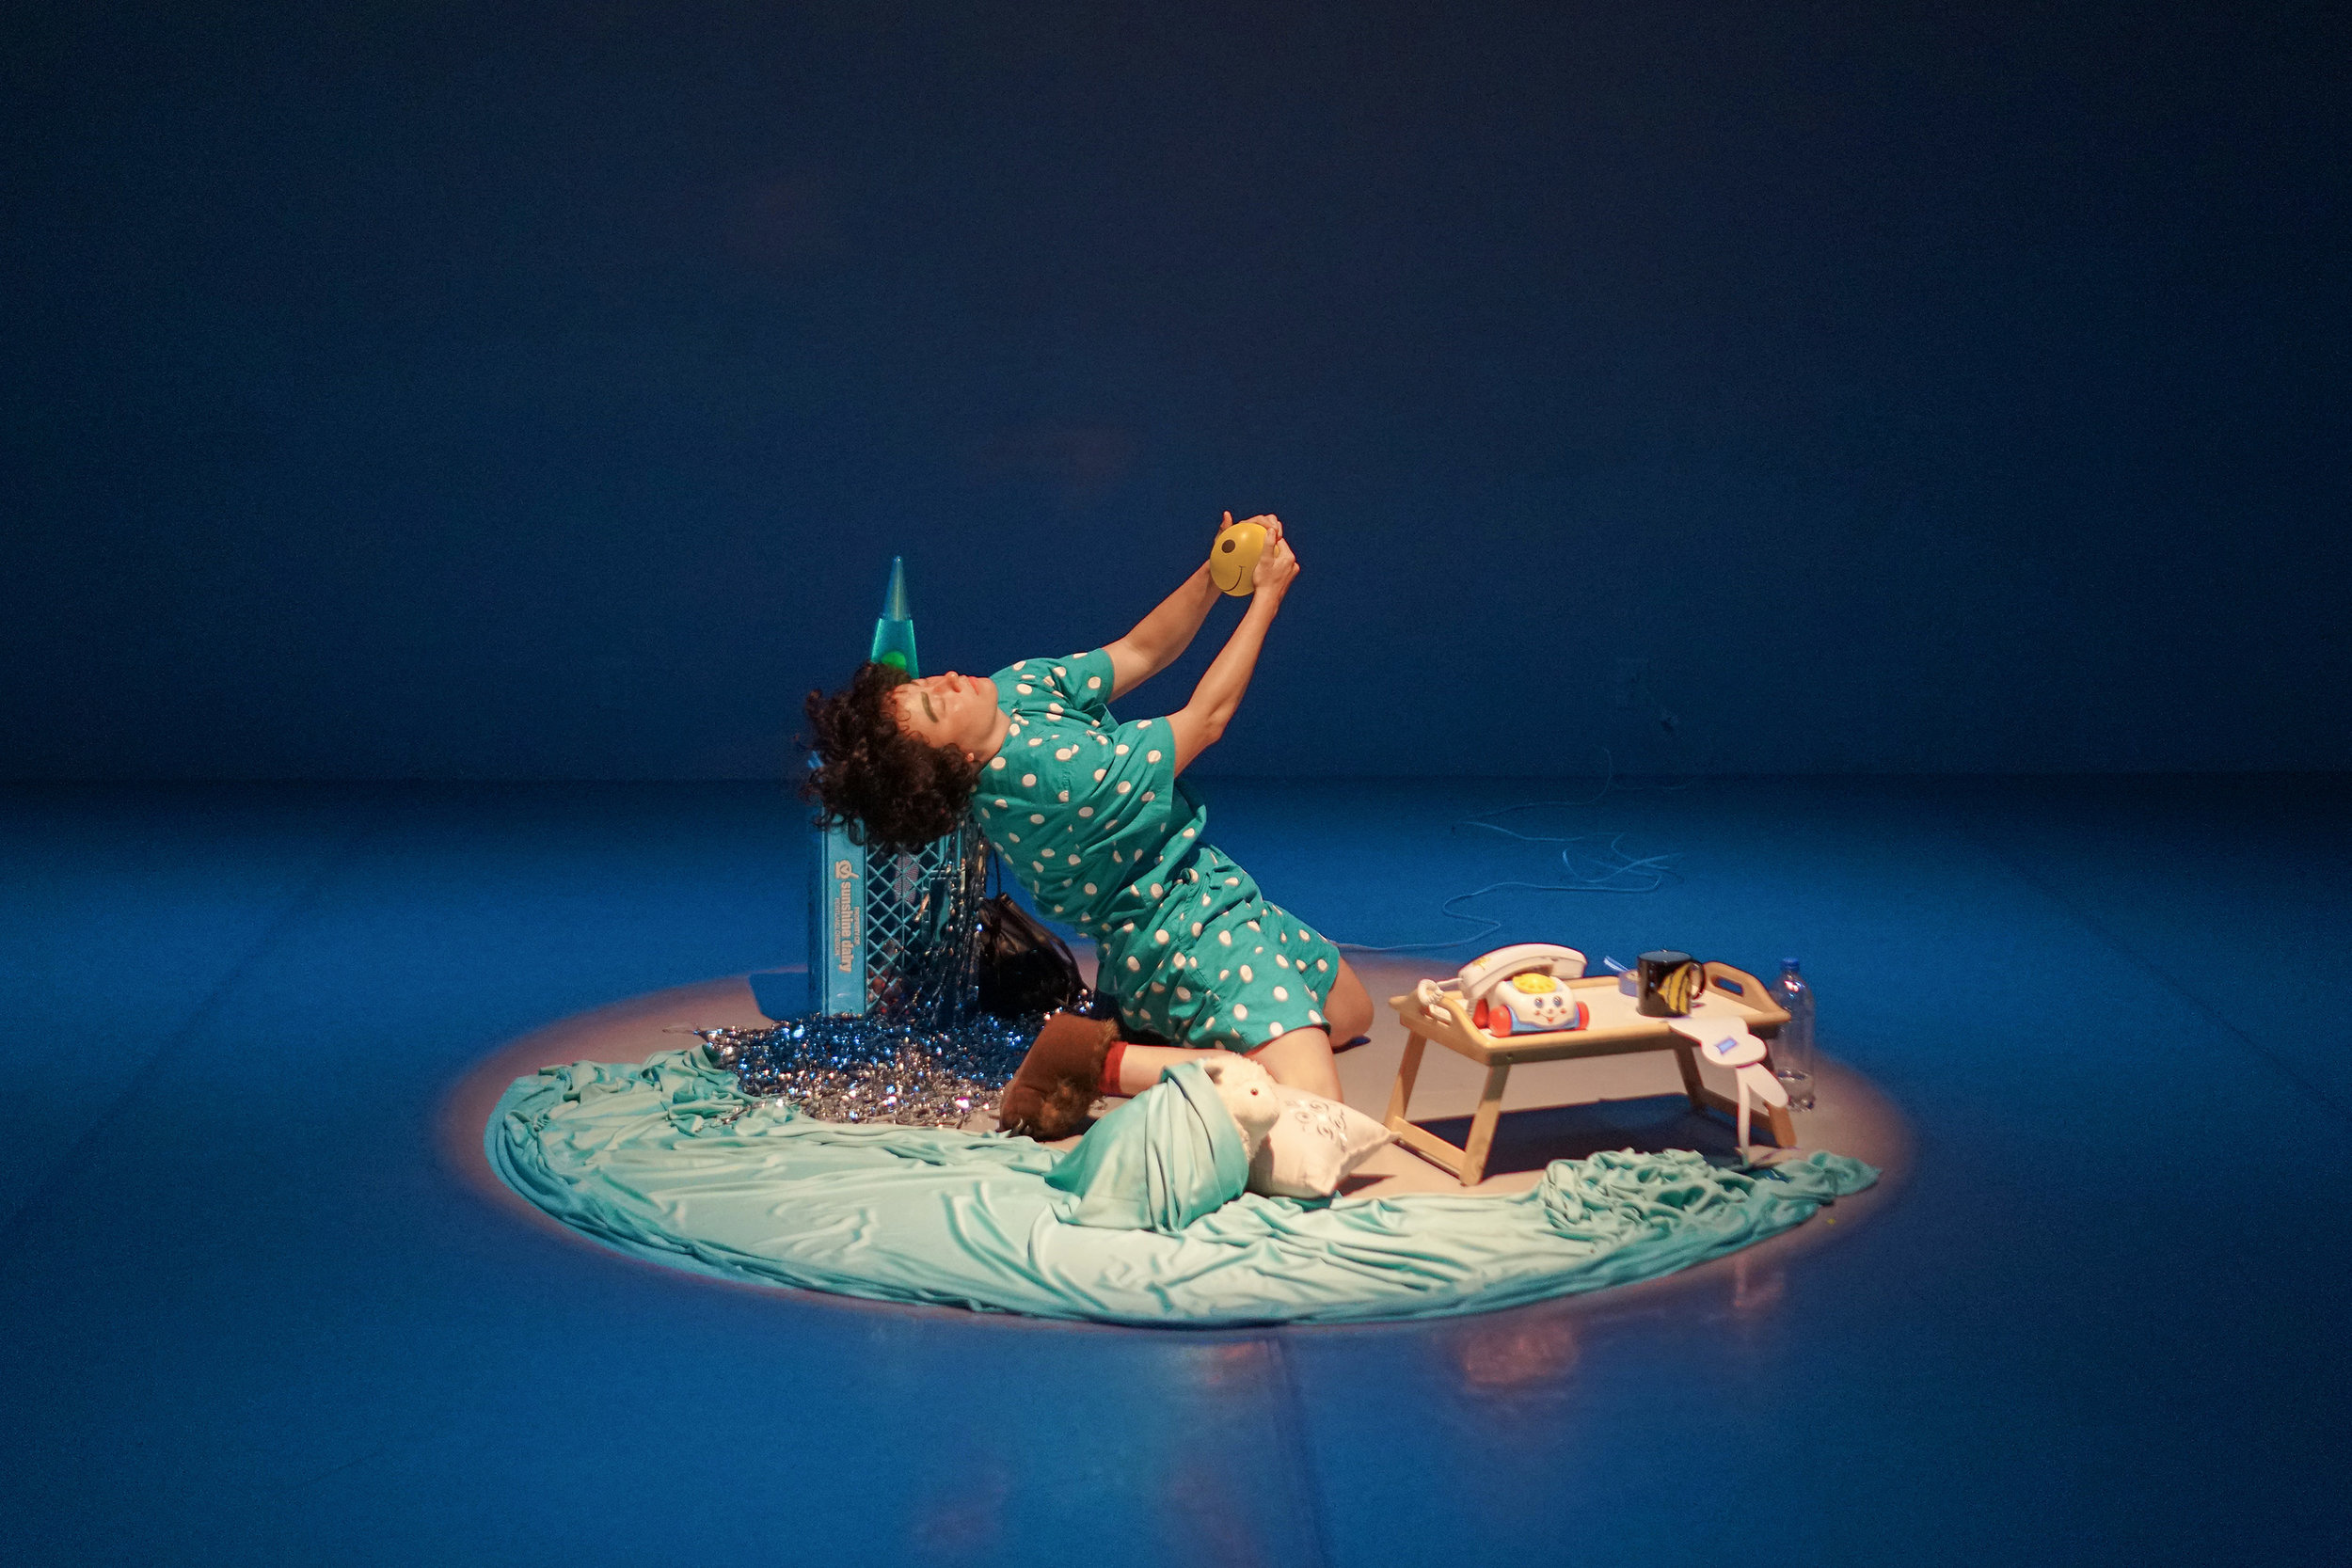 Photo by Erik Molano featuring Alyza DelPan Monley's work  Duet of Self